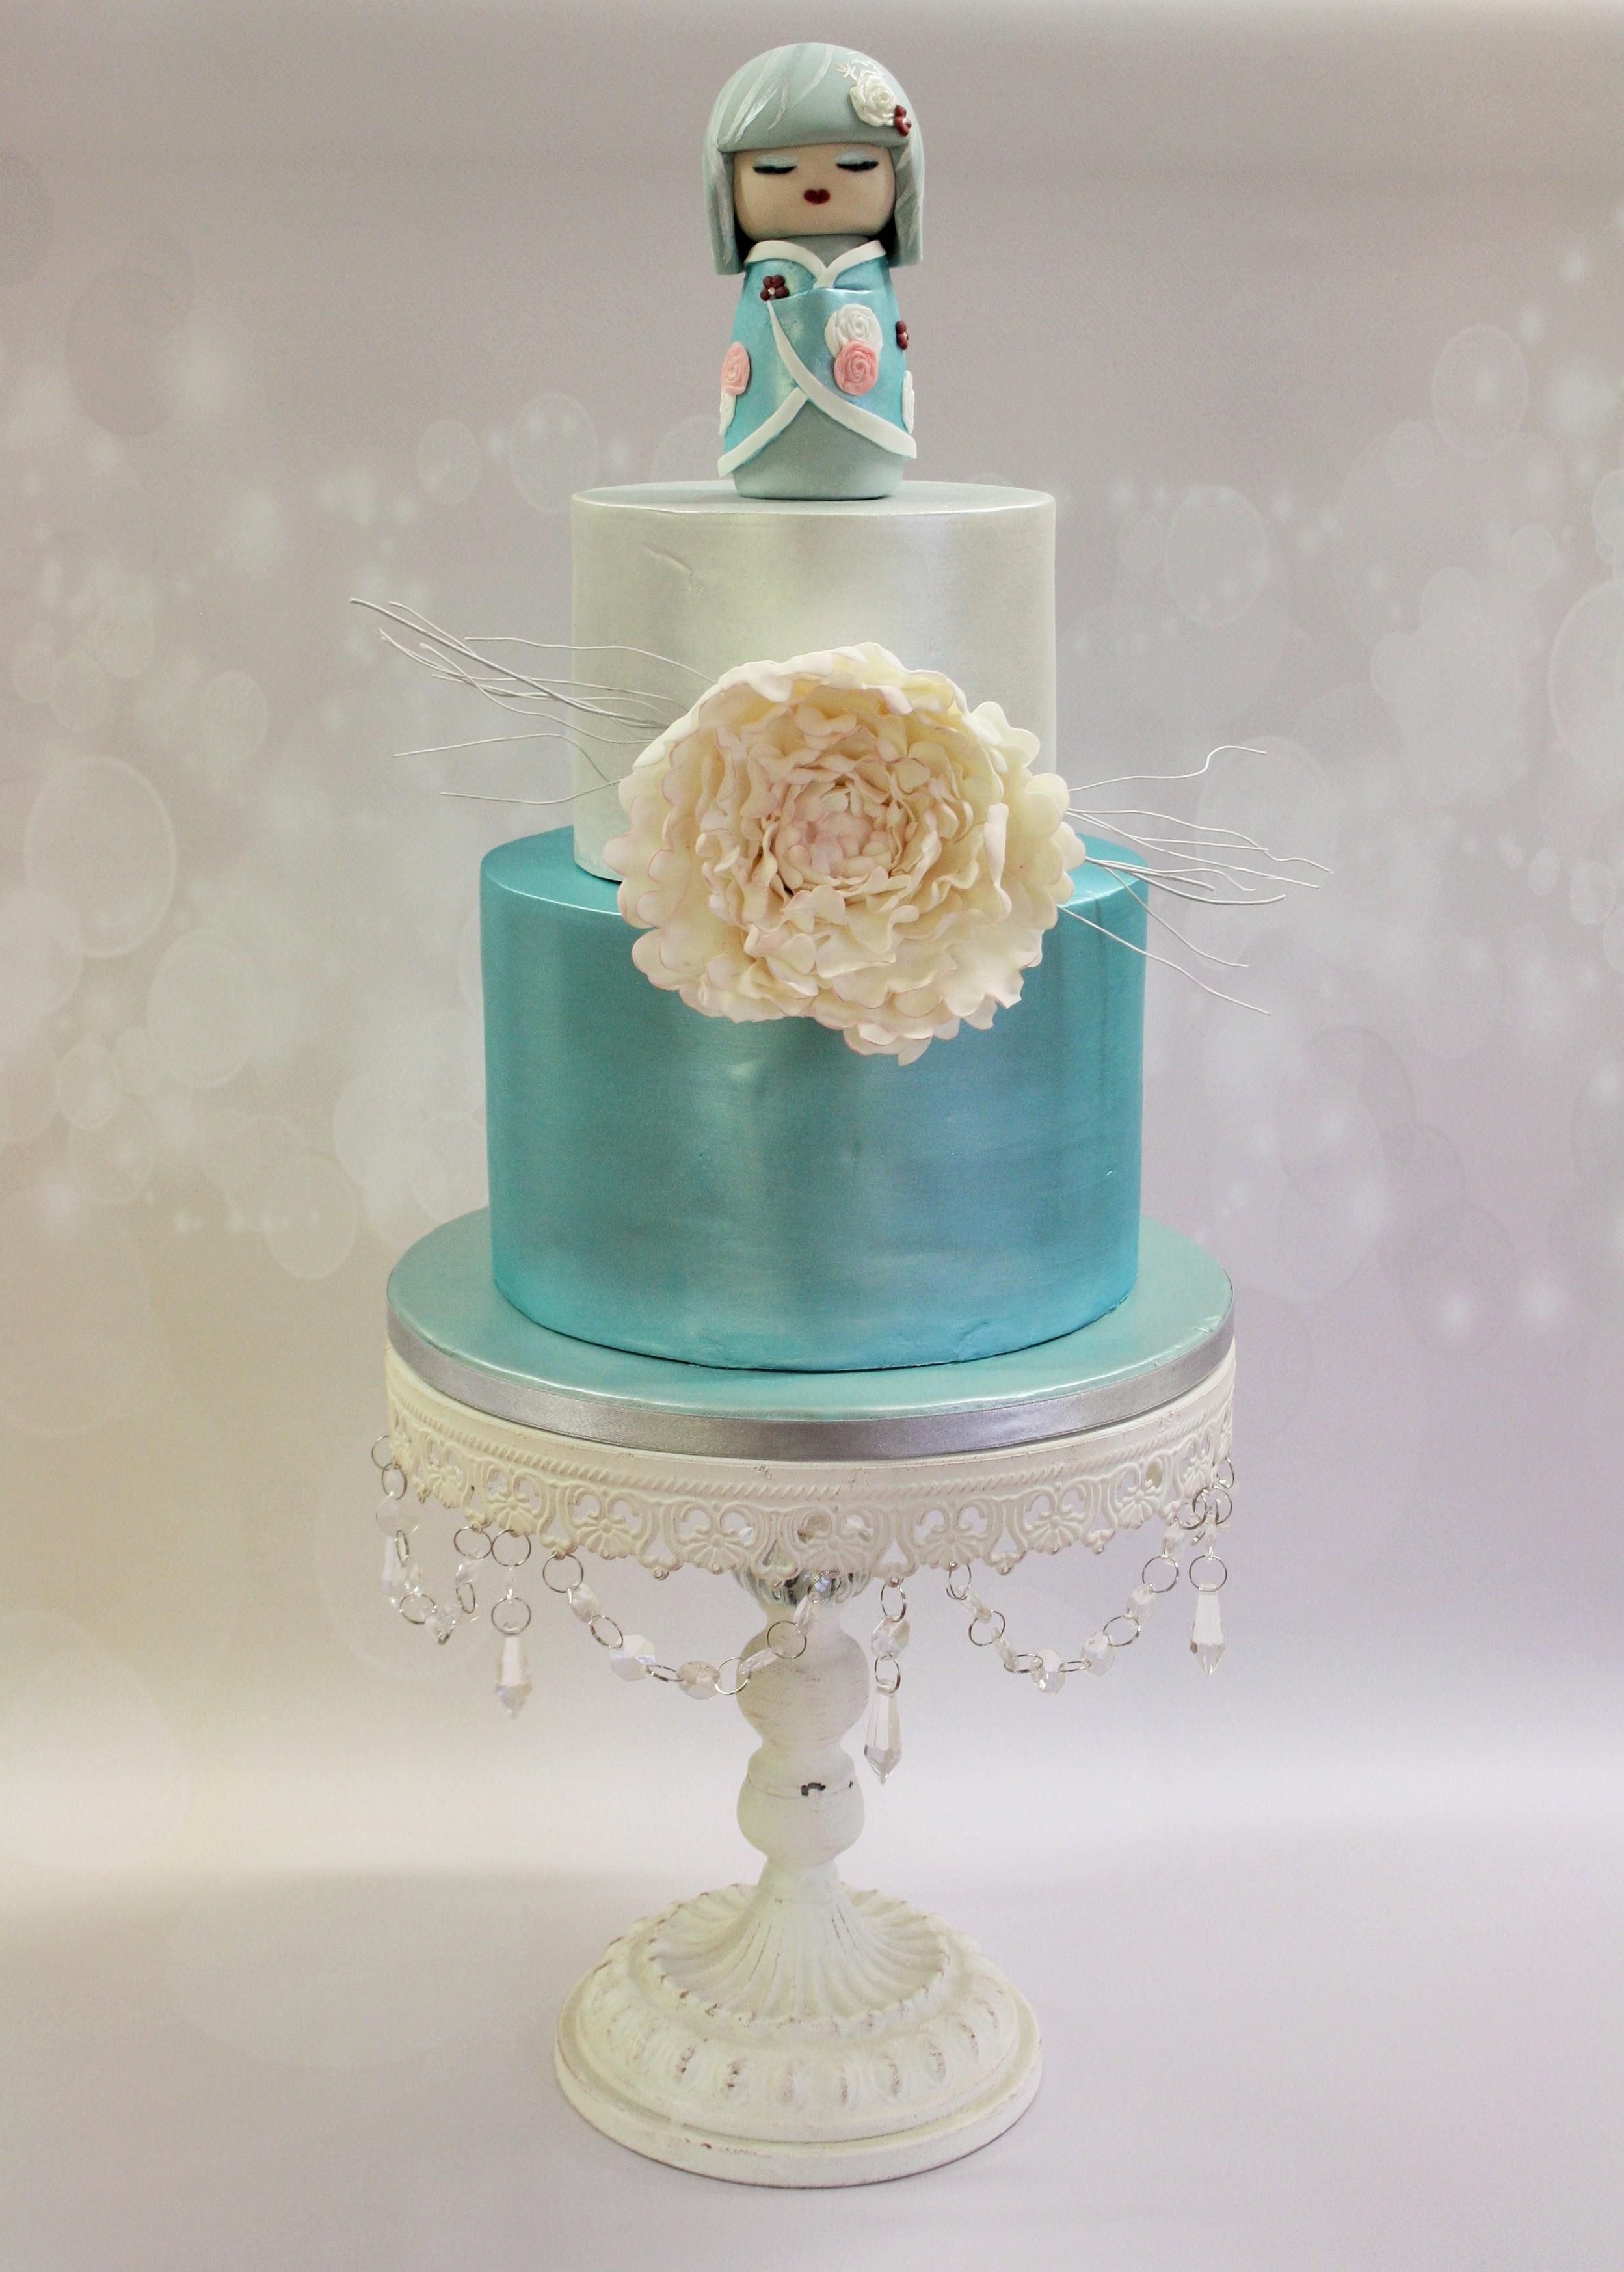 Kimmidoll Cake 1.jpg